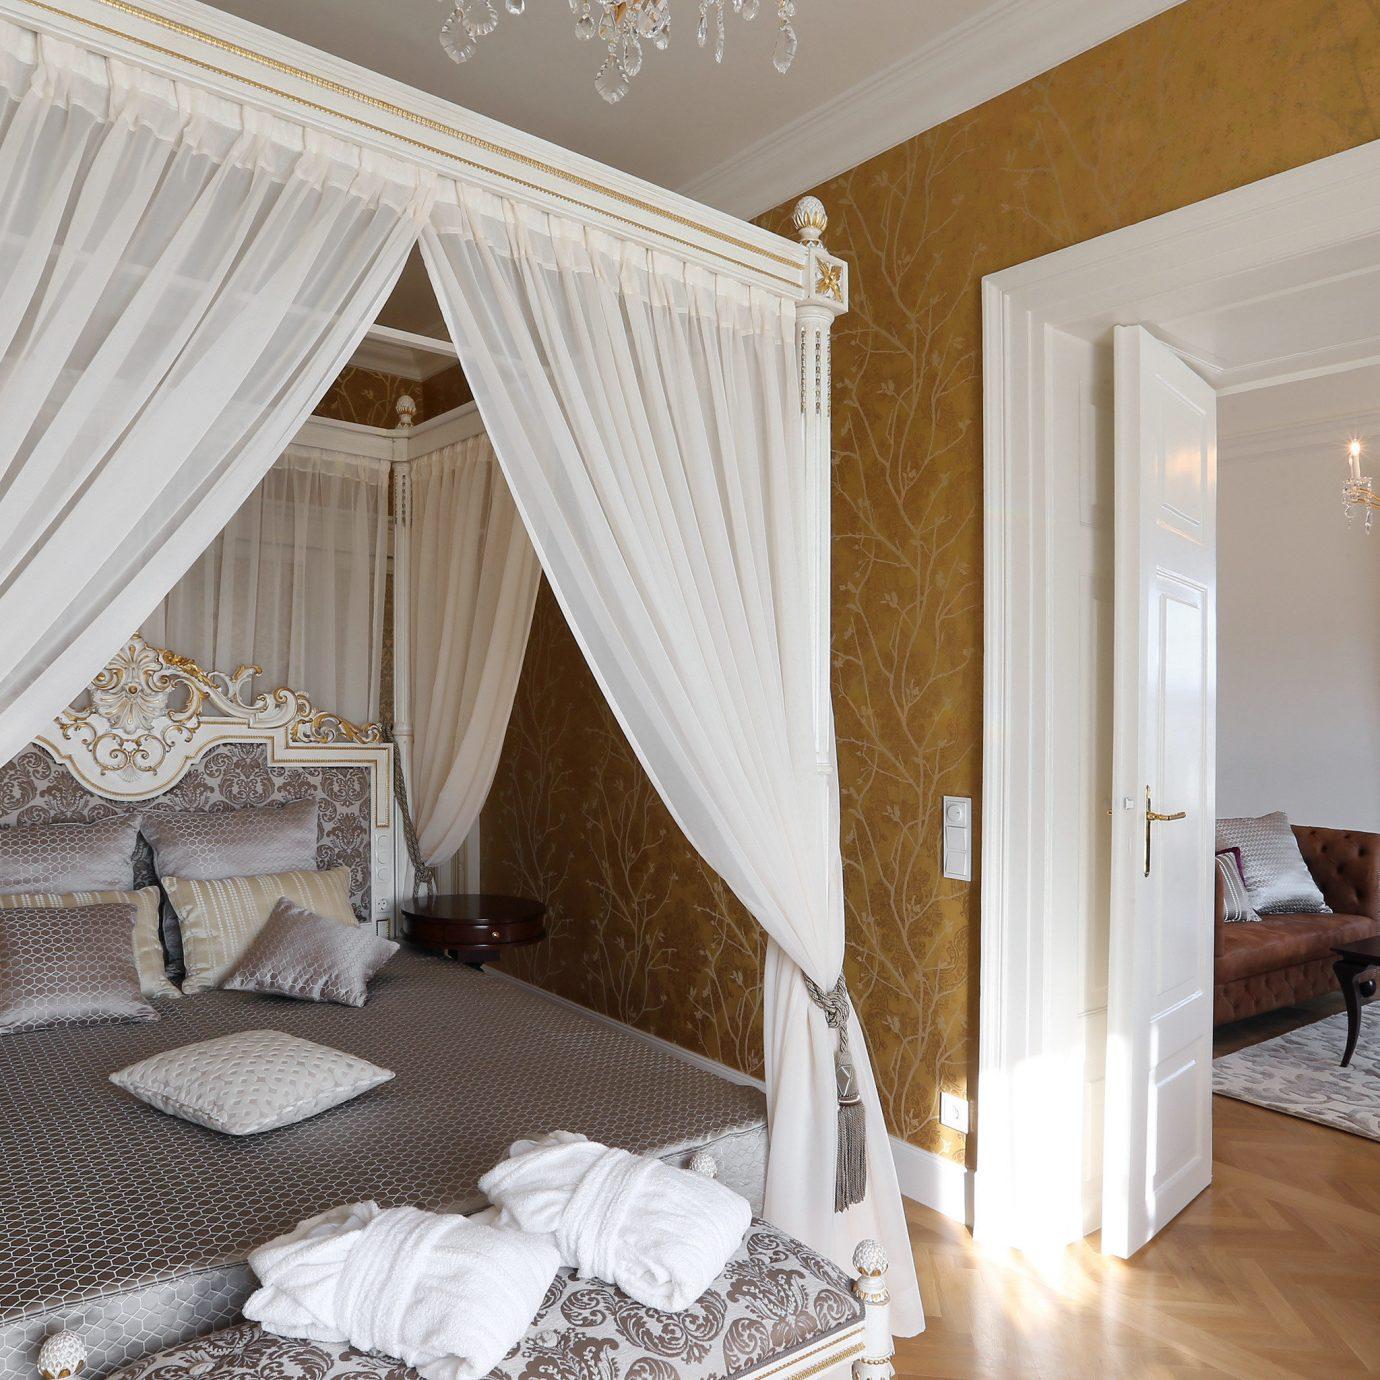 Adult-only Bedroom Elegant Luxury Resort Suite curtain property cottage home living room mansion